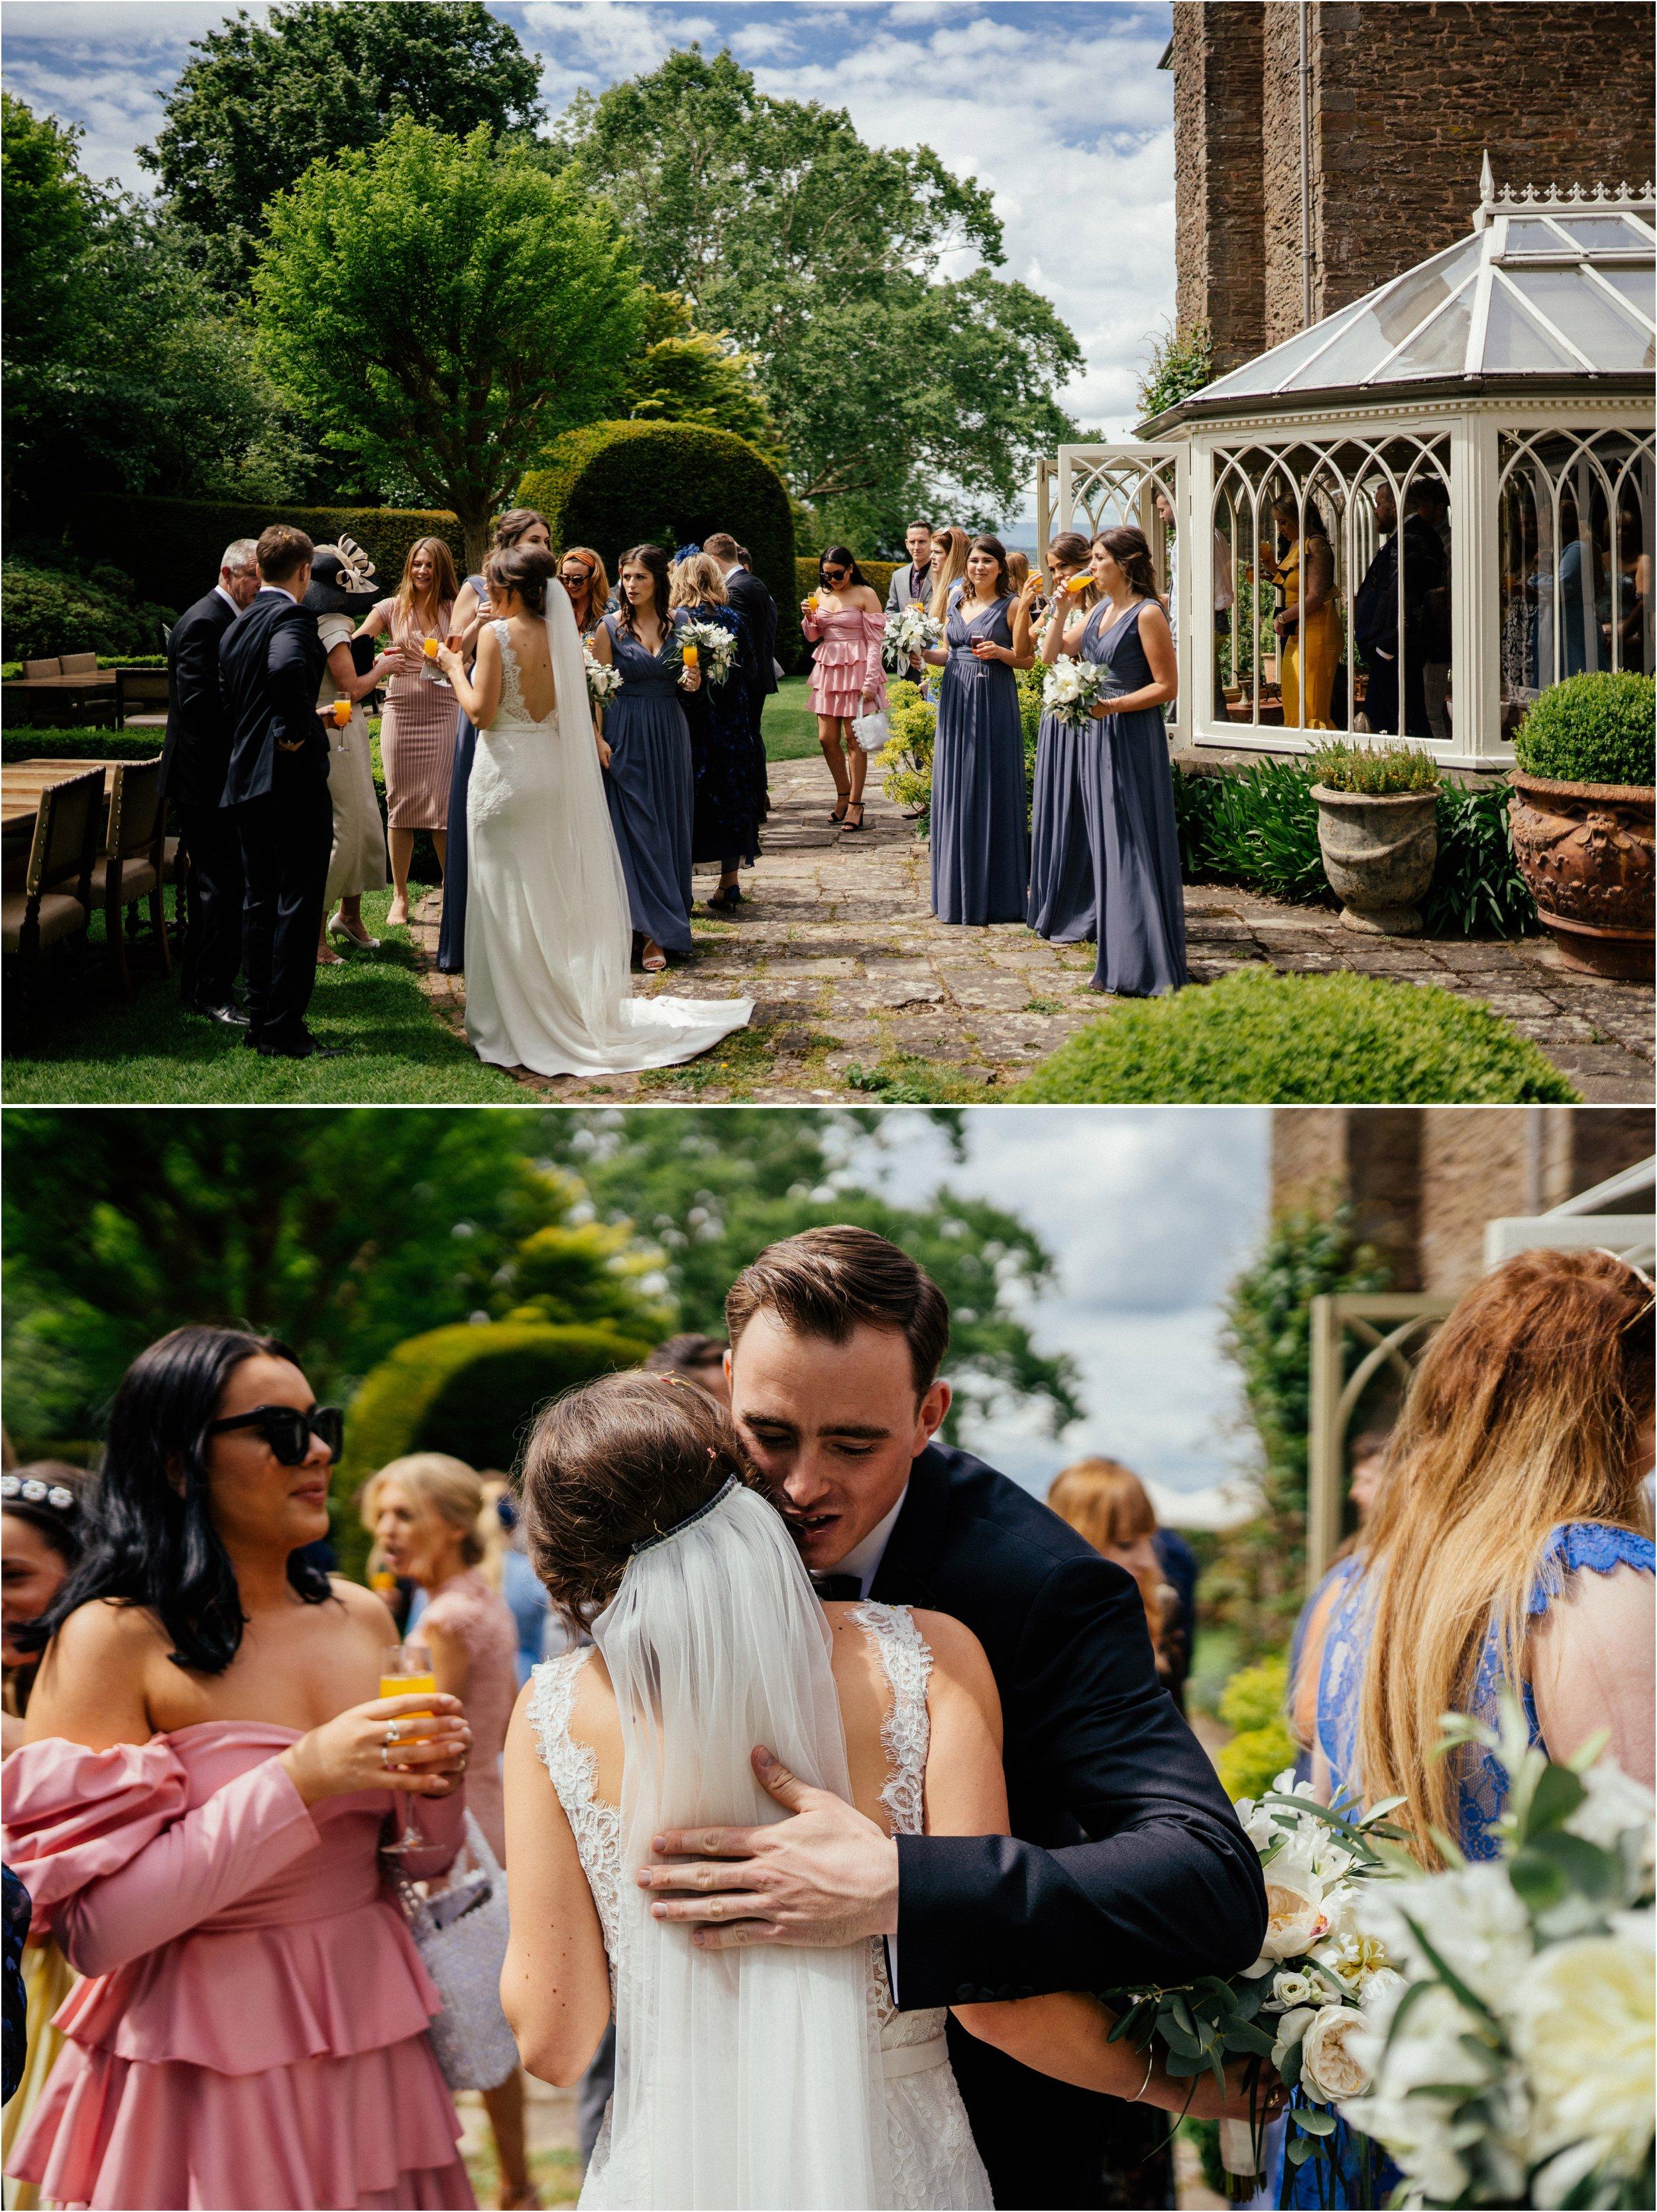 Dewsall Court Herefordshire wedding photographer_0055.jpg